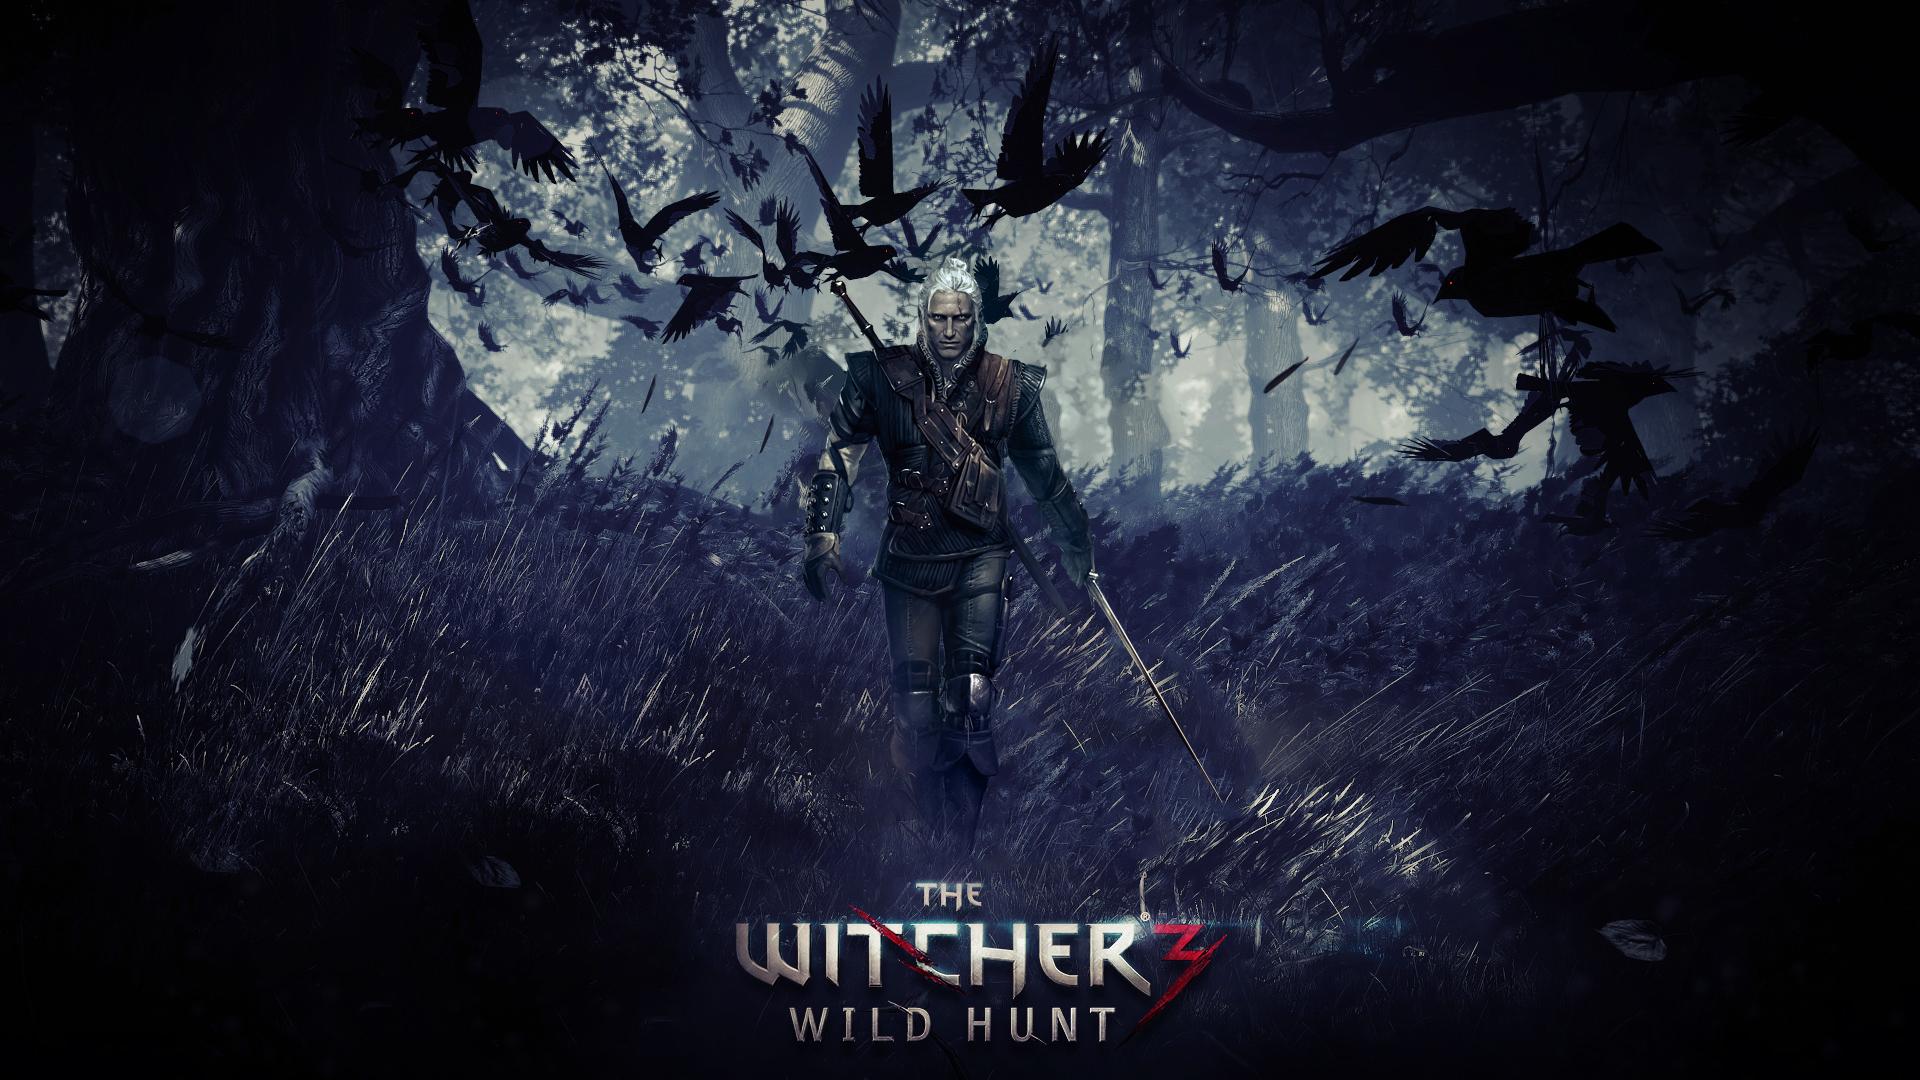 witcher 3 wallpaper 1080x1920